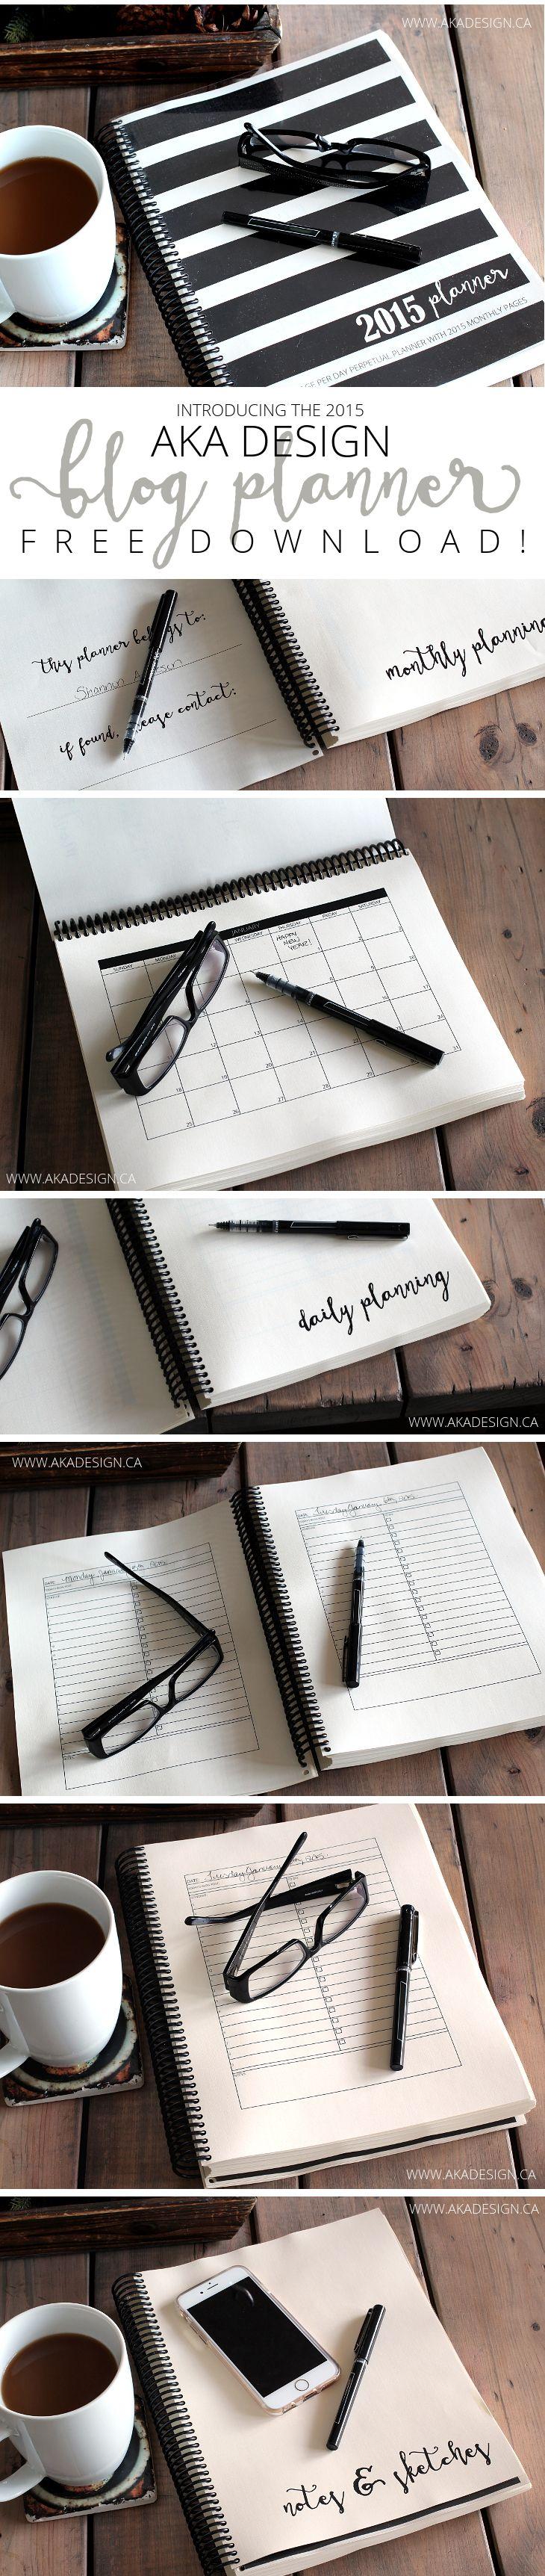 #Papercraft #Calendar | #Planner- #Papercrafting - Blog Planner and Editorial Calendar (FREE PRINTABLE)